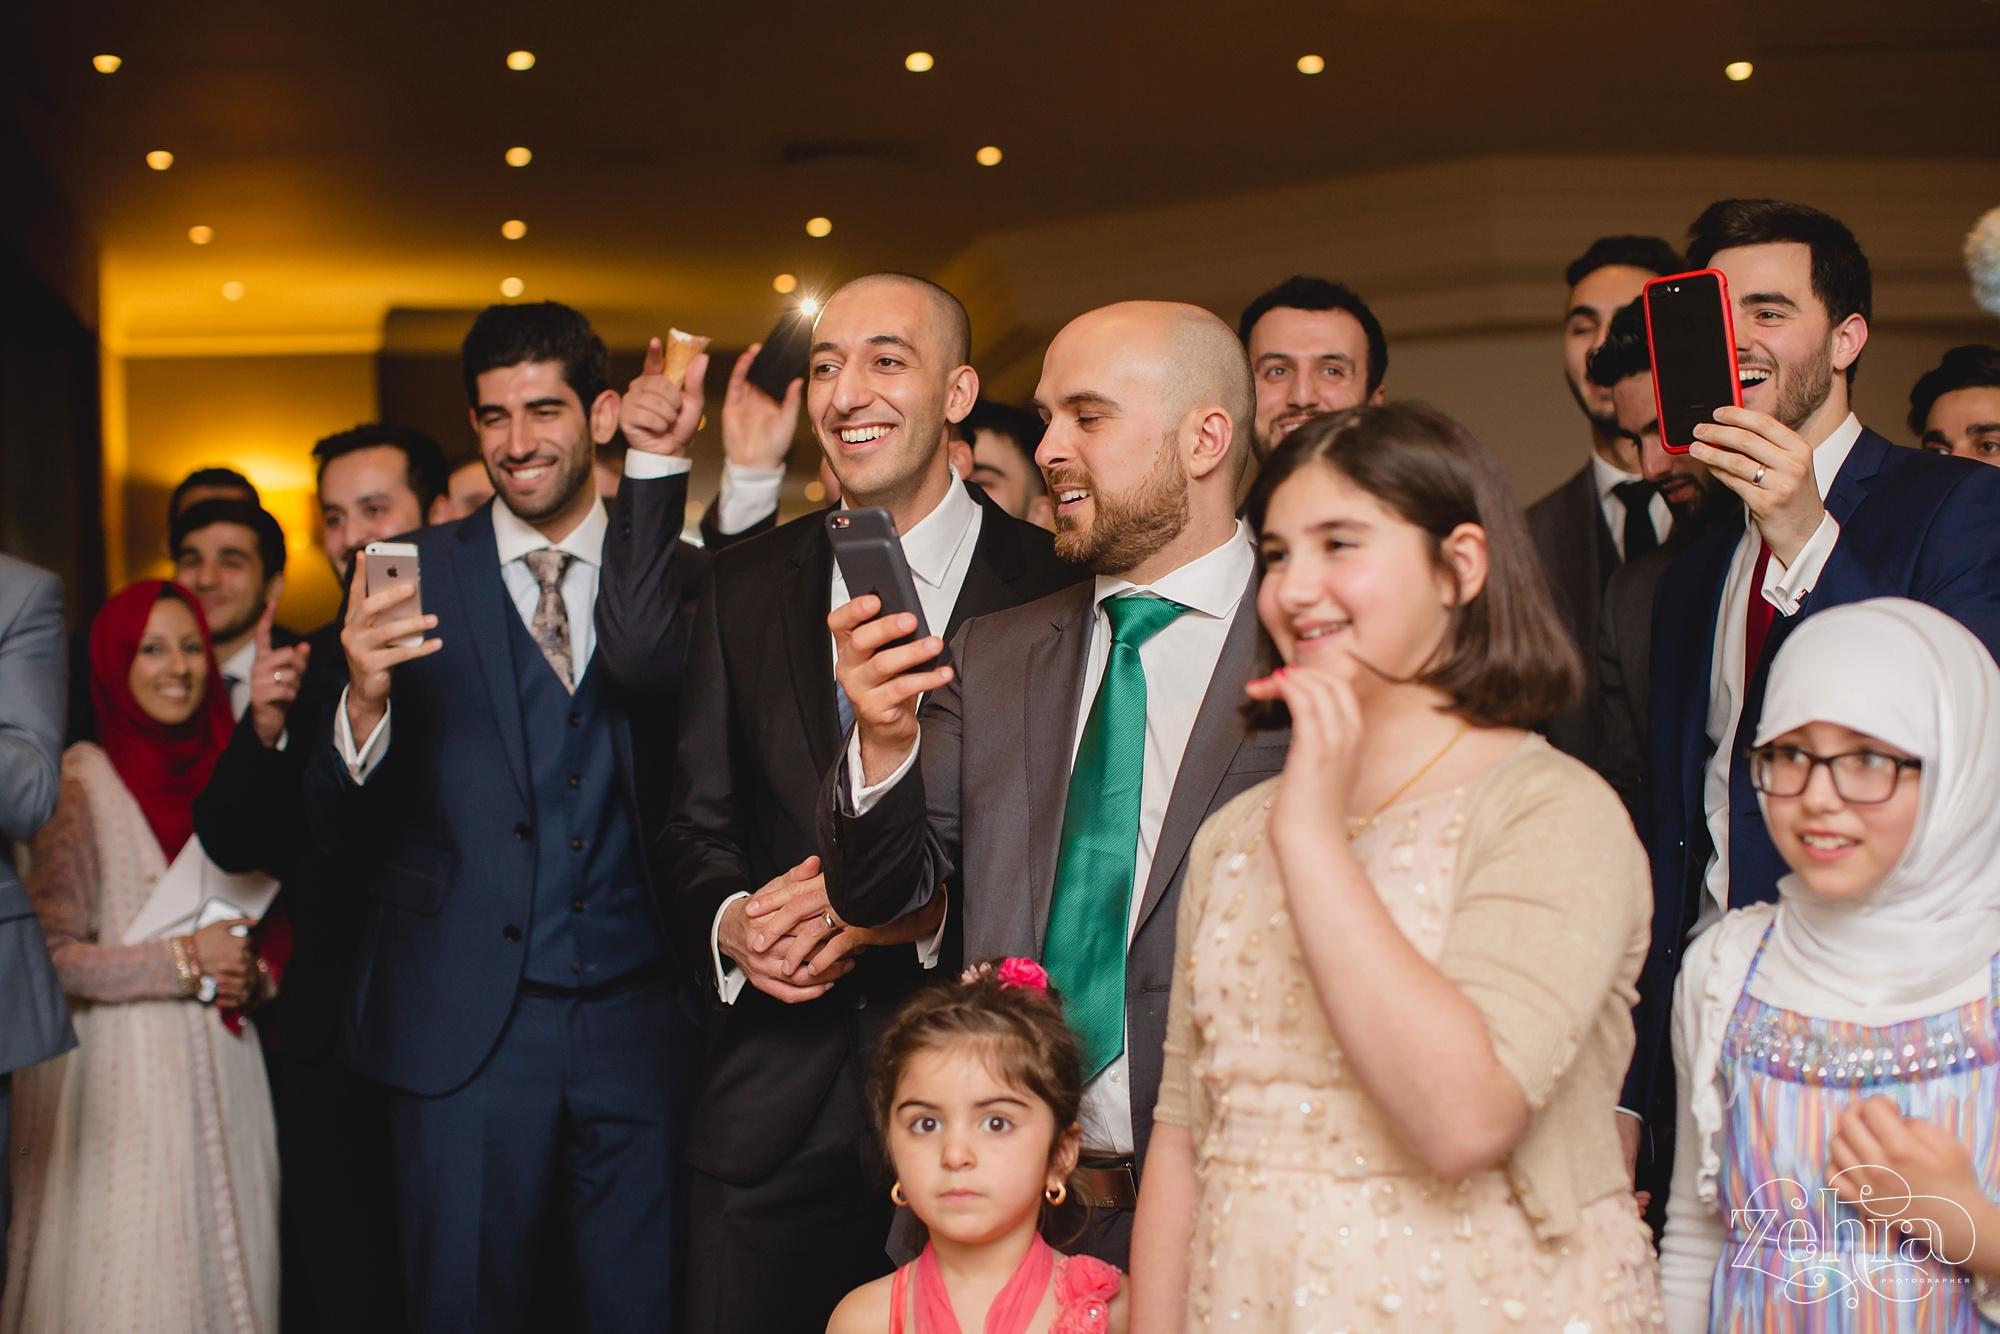 zehra photographer mere cheshire wedding_0044.jpg